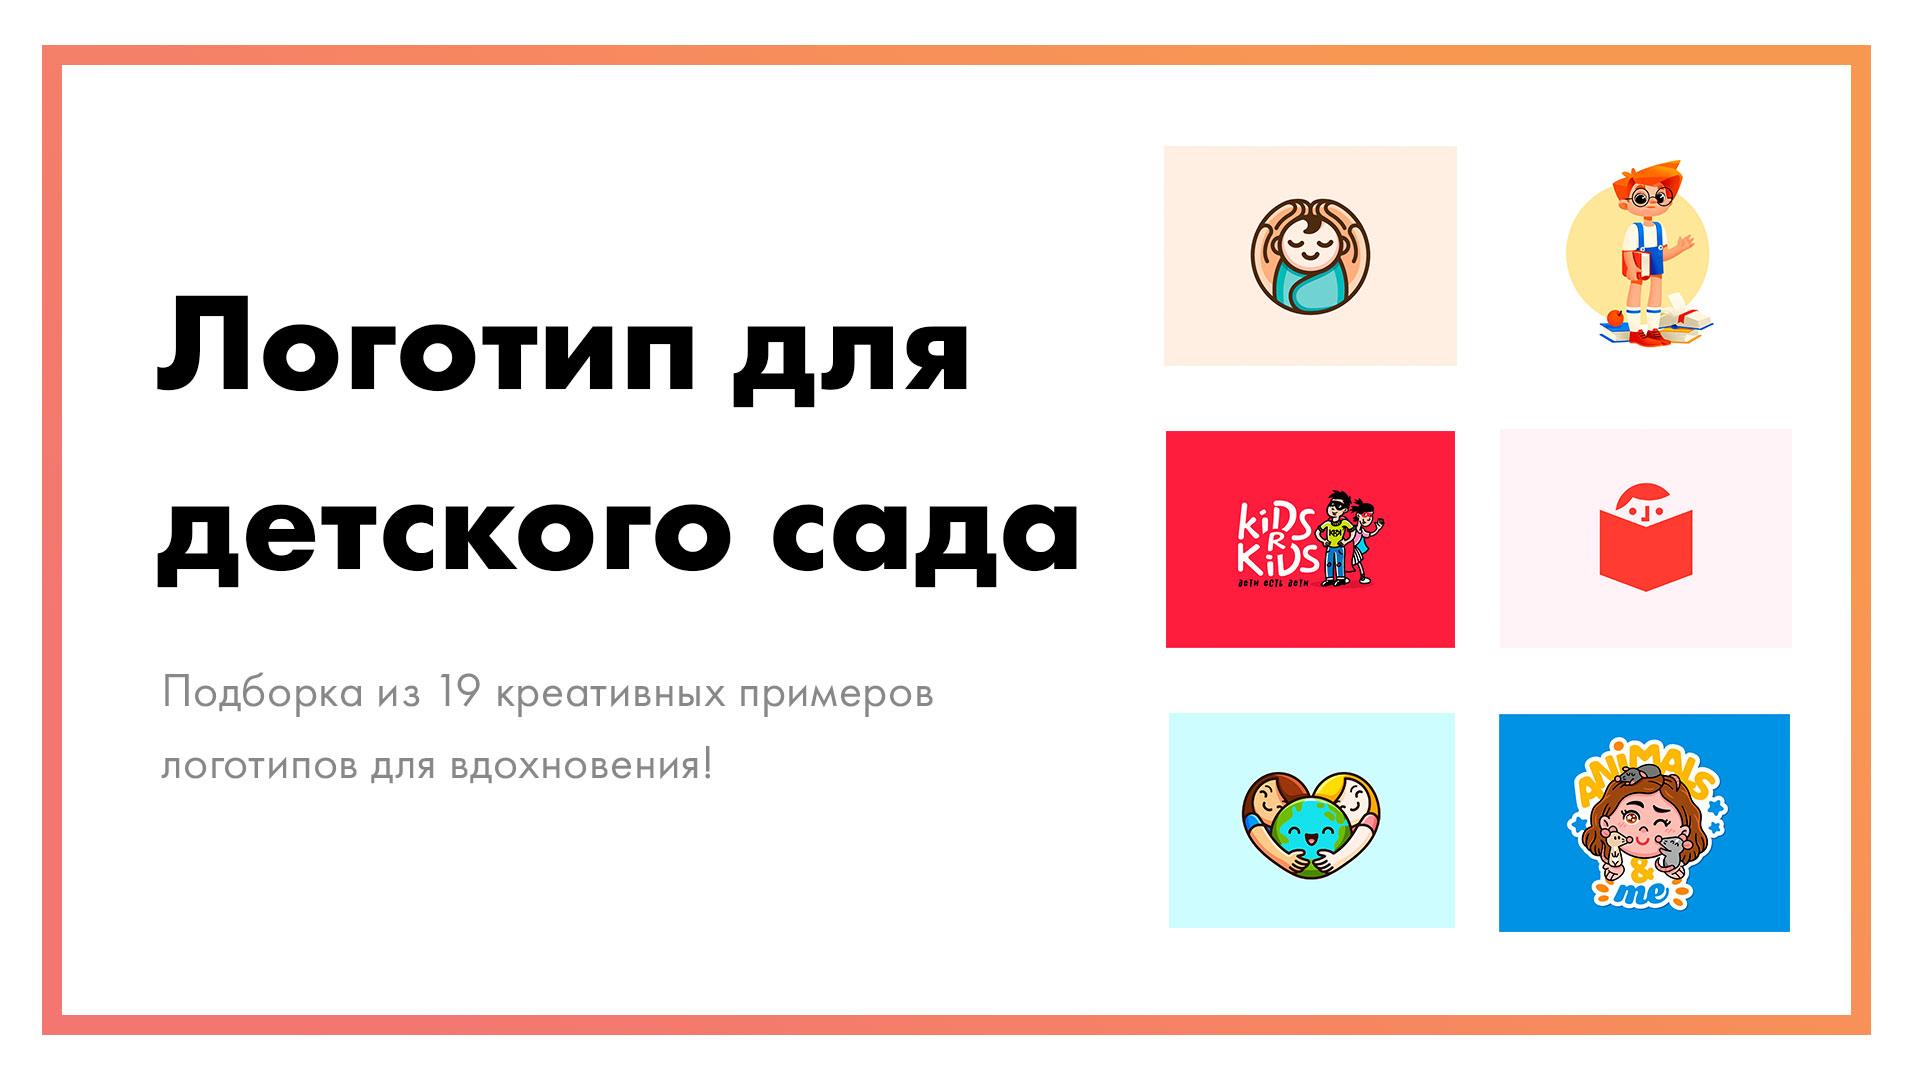 Логотип-детского-сада-–-создайте-онлайн-[+-19-креативных-примеров].jpg